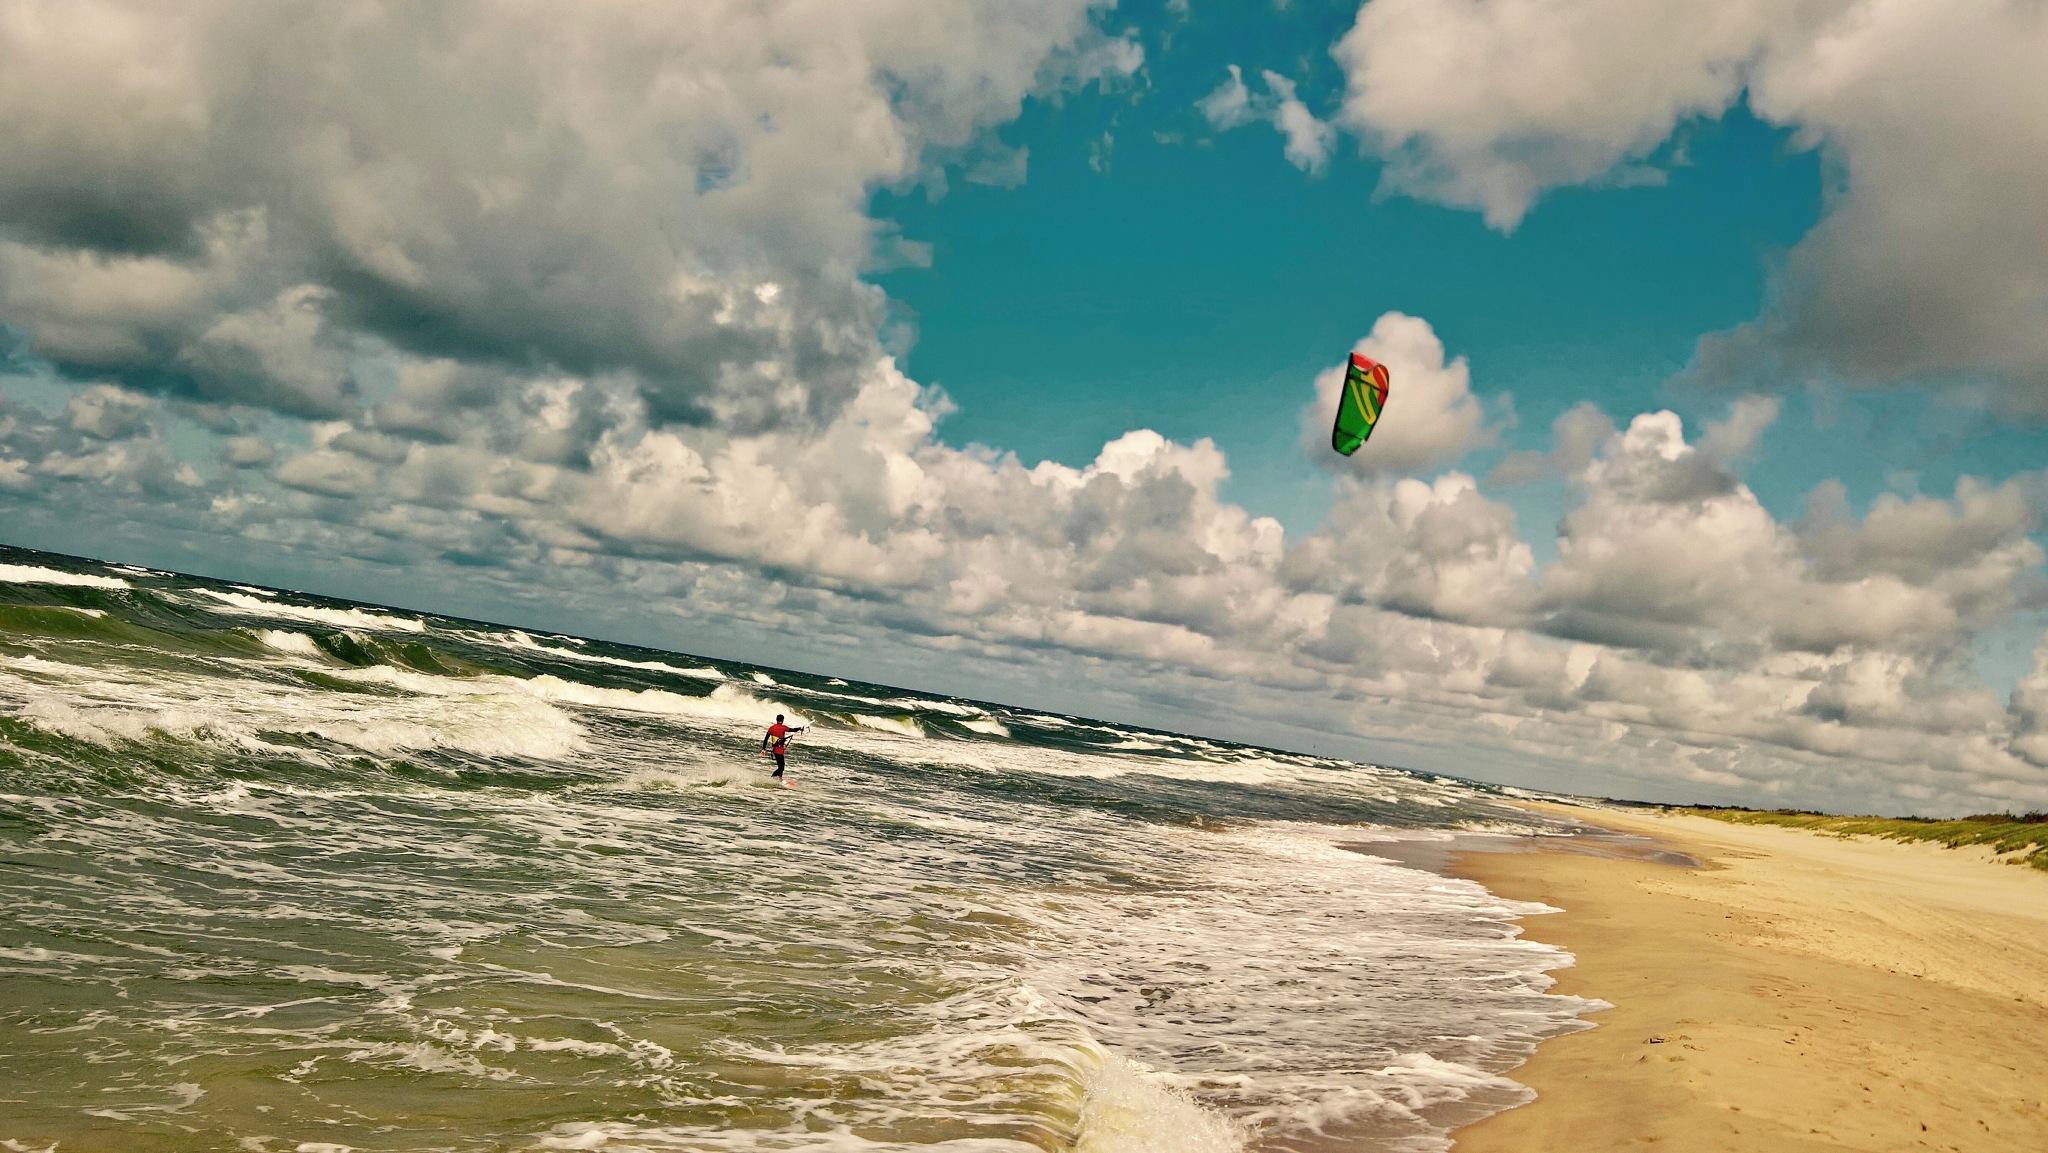 In loving memory to Summer by Edmundas Laukaitis